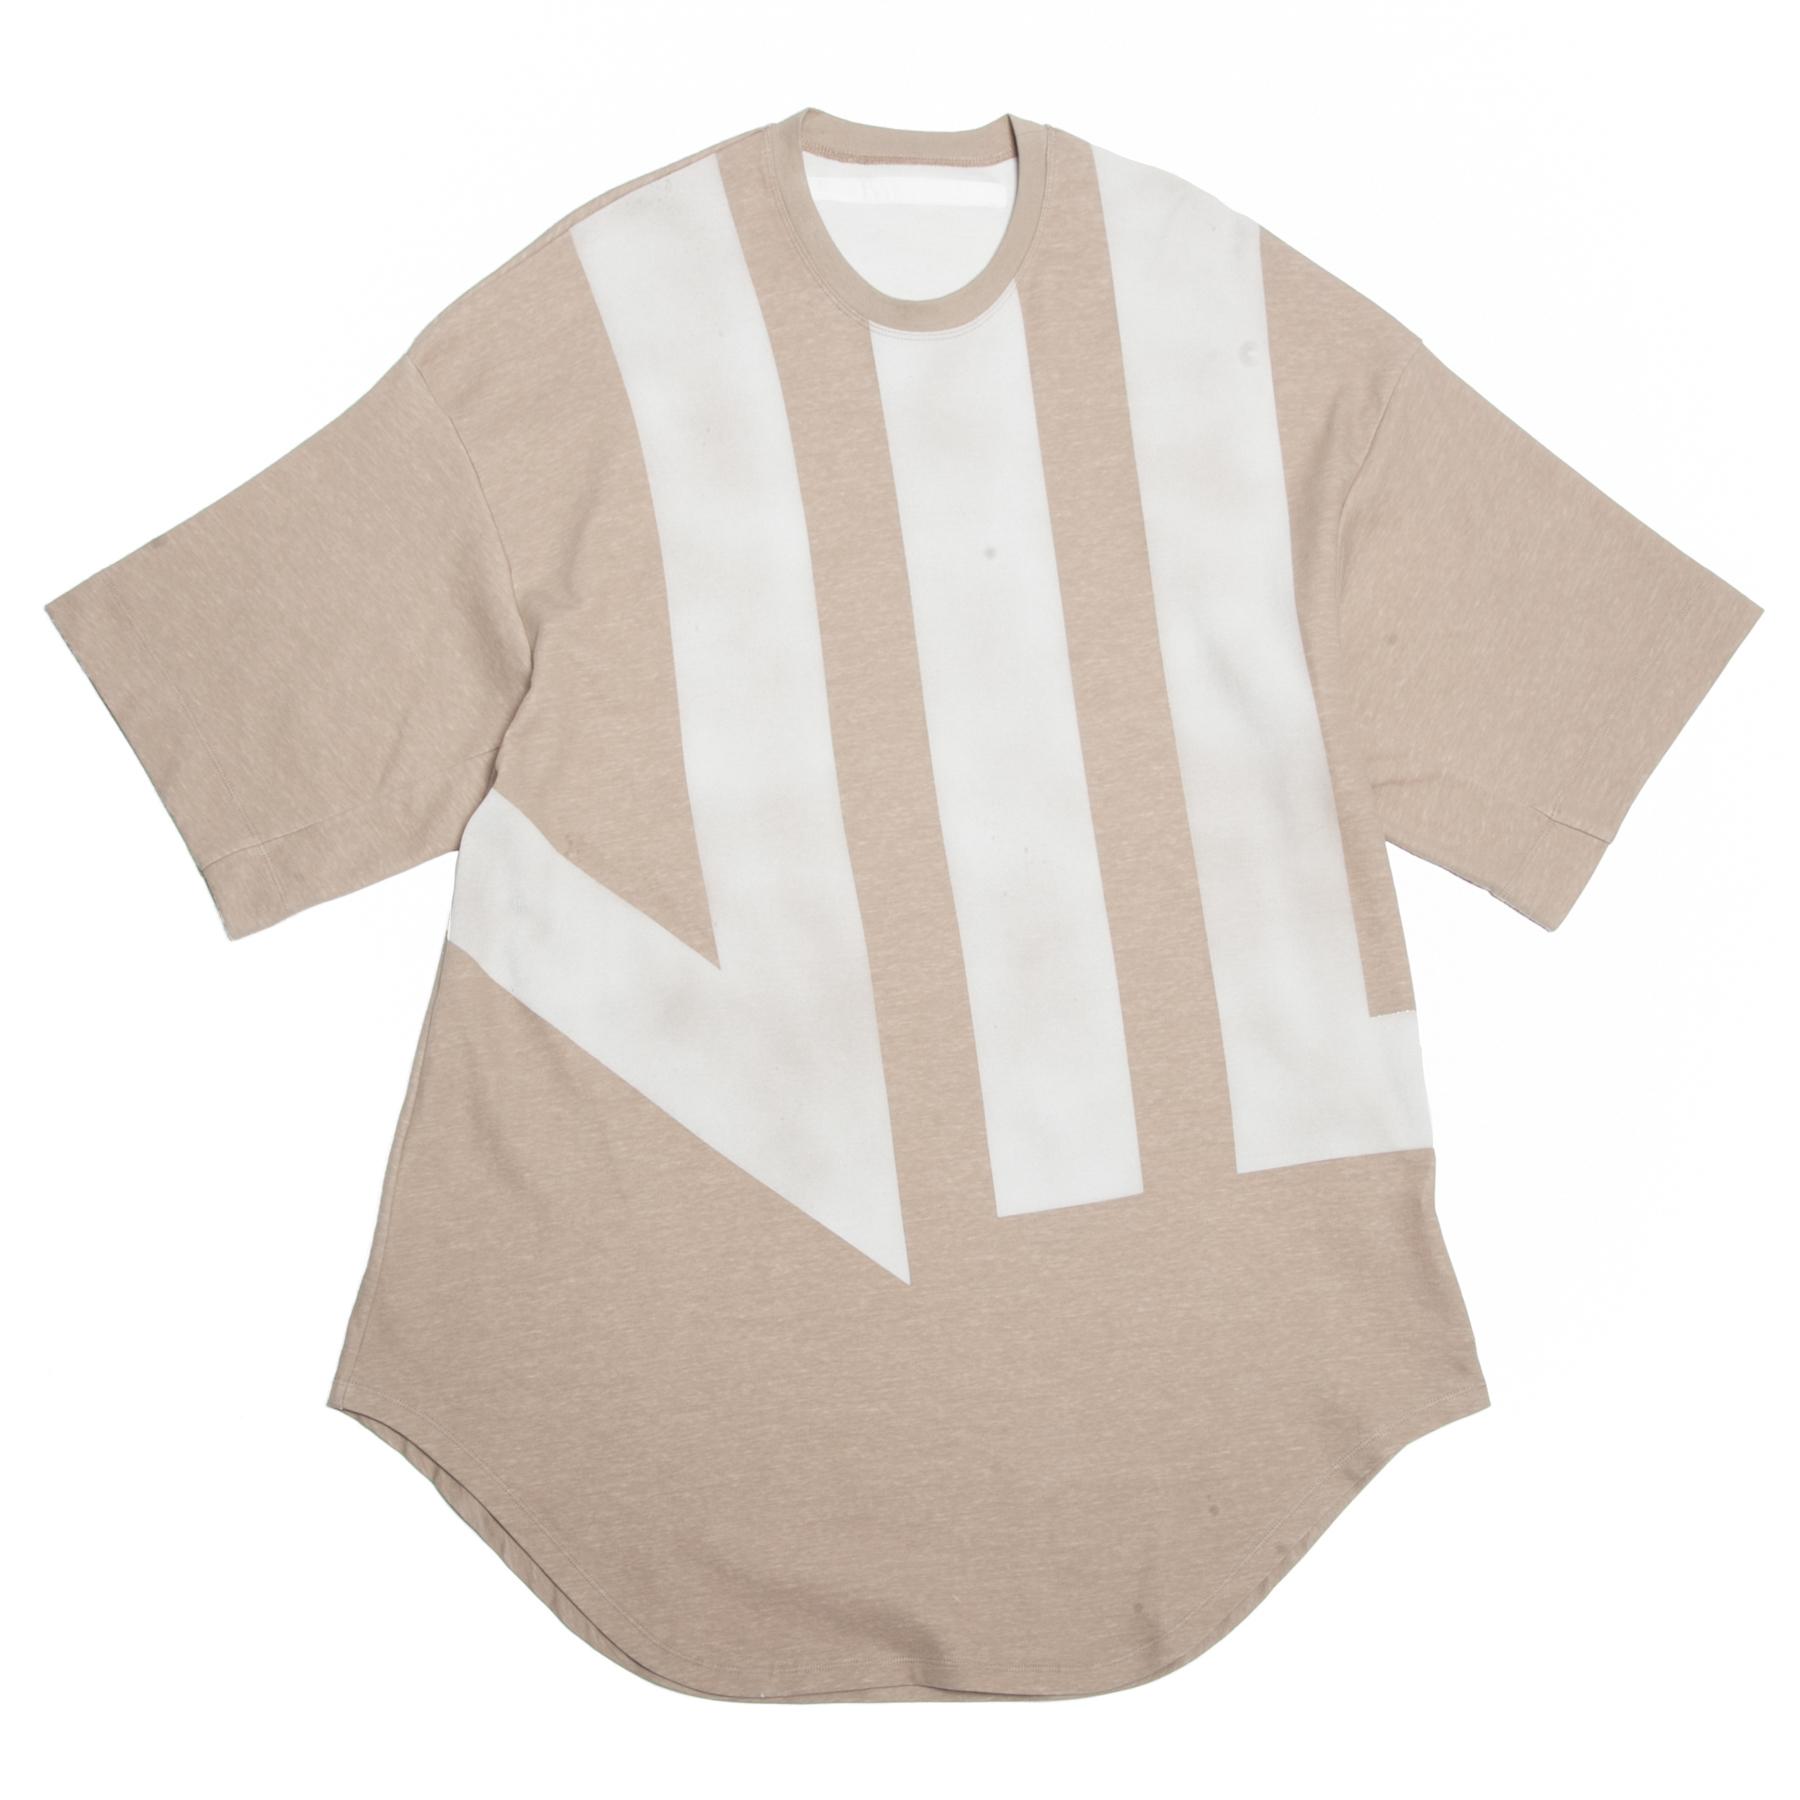 640CPM4-BEIGE / 家紋ラウンドスウェットTシャツ